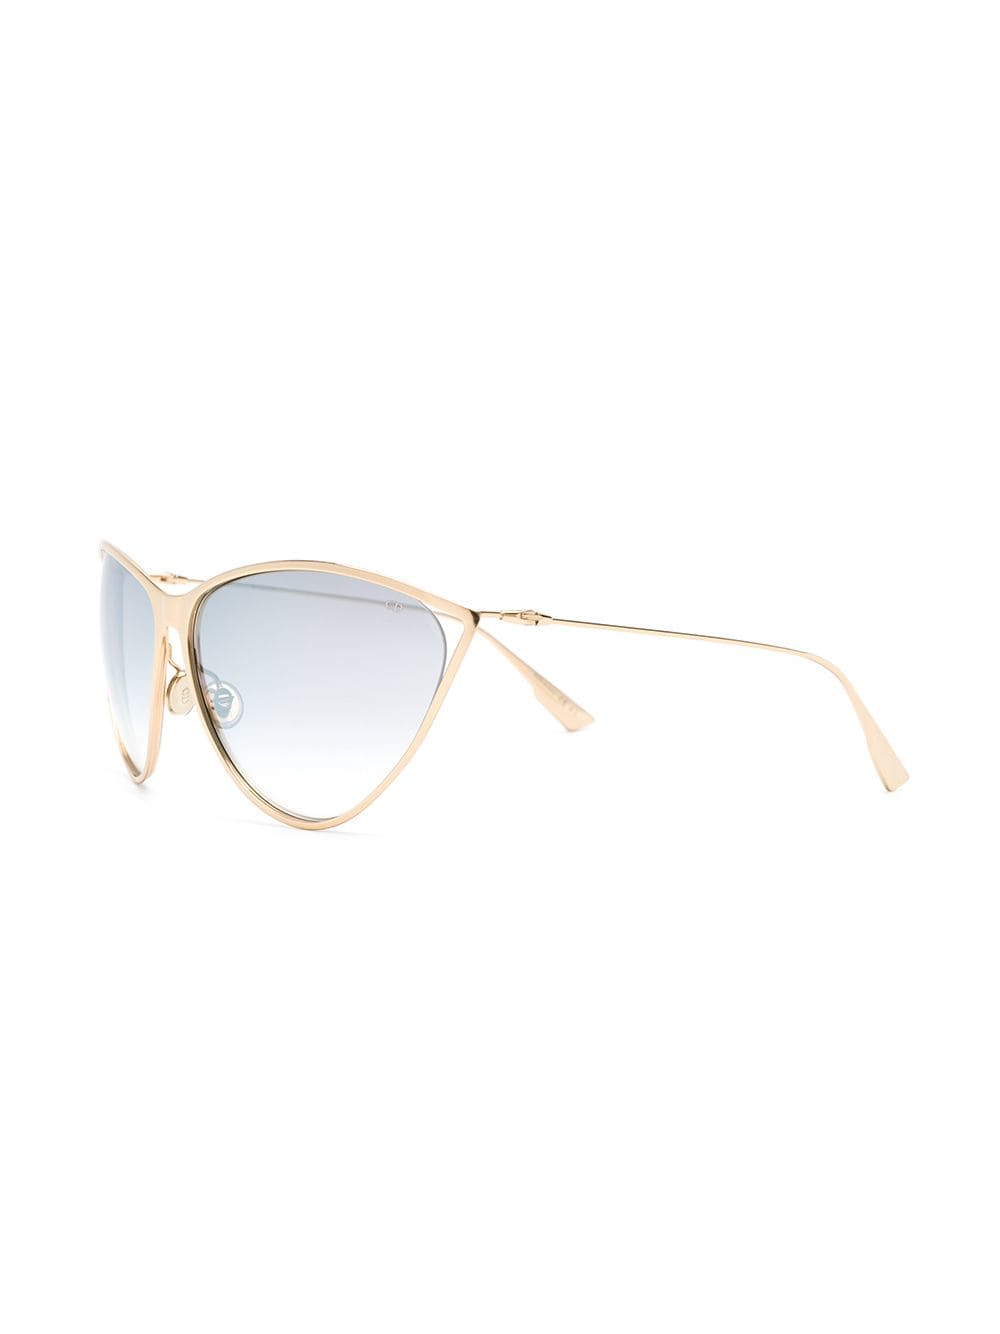 71ad36801c Dior eyewear gafas de sol new motard - dorado